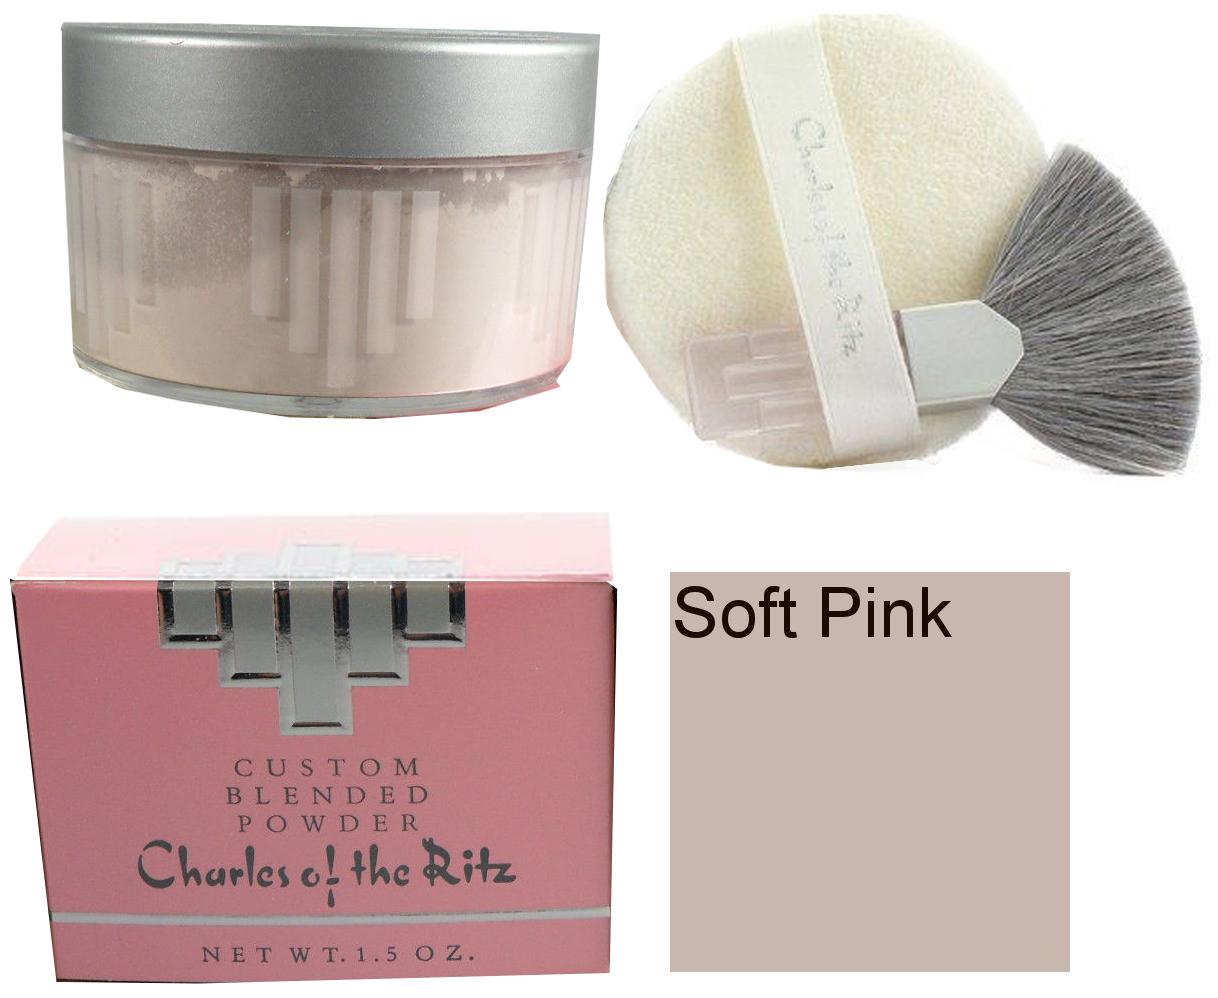 Charles of the Ritz Custom Blended Powder - Soft Pink